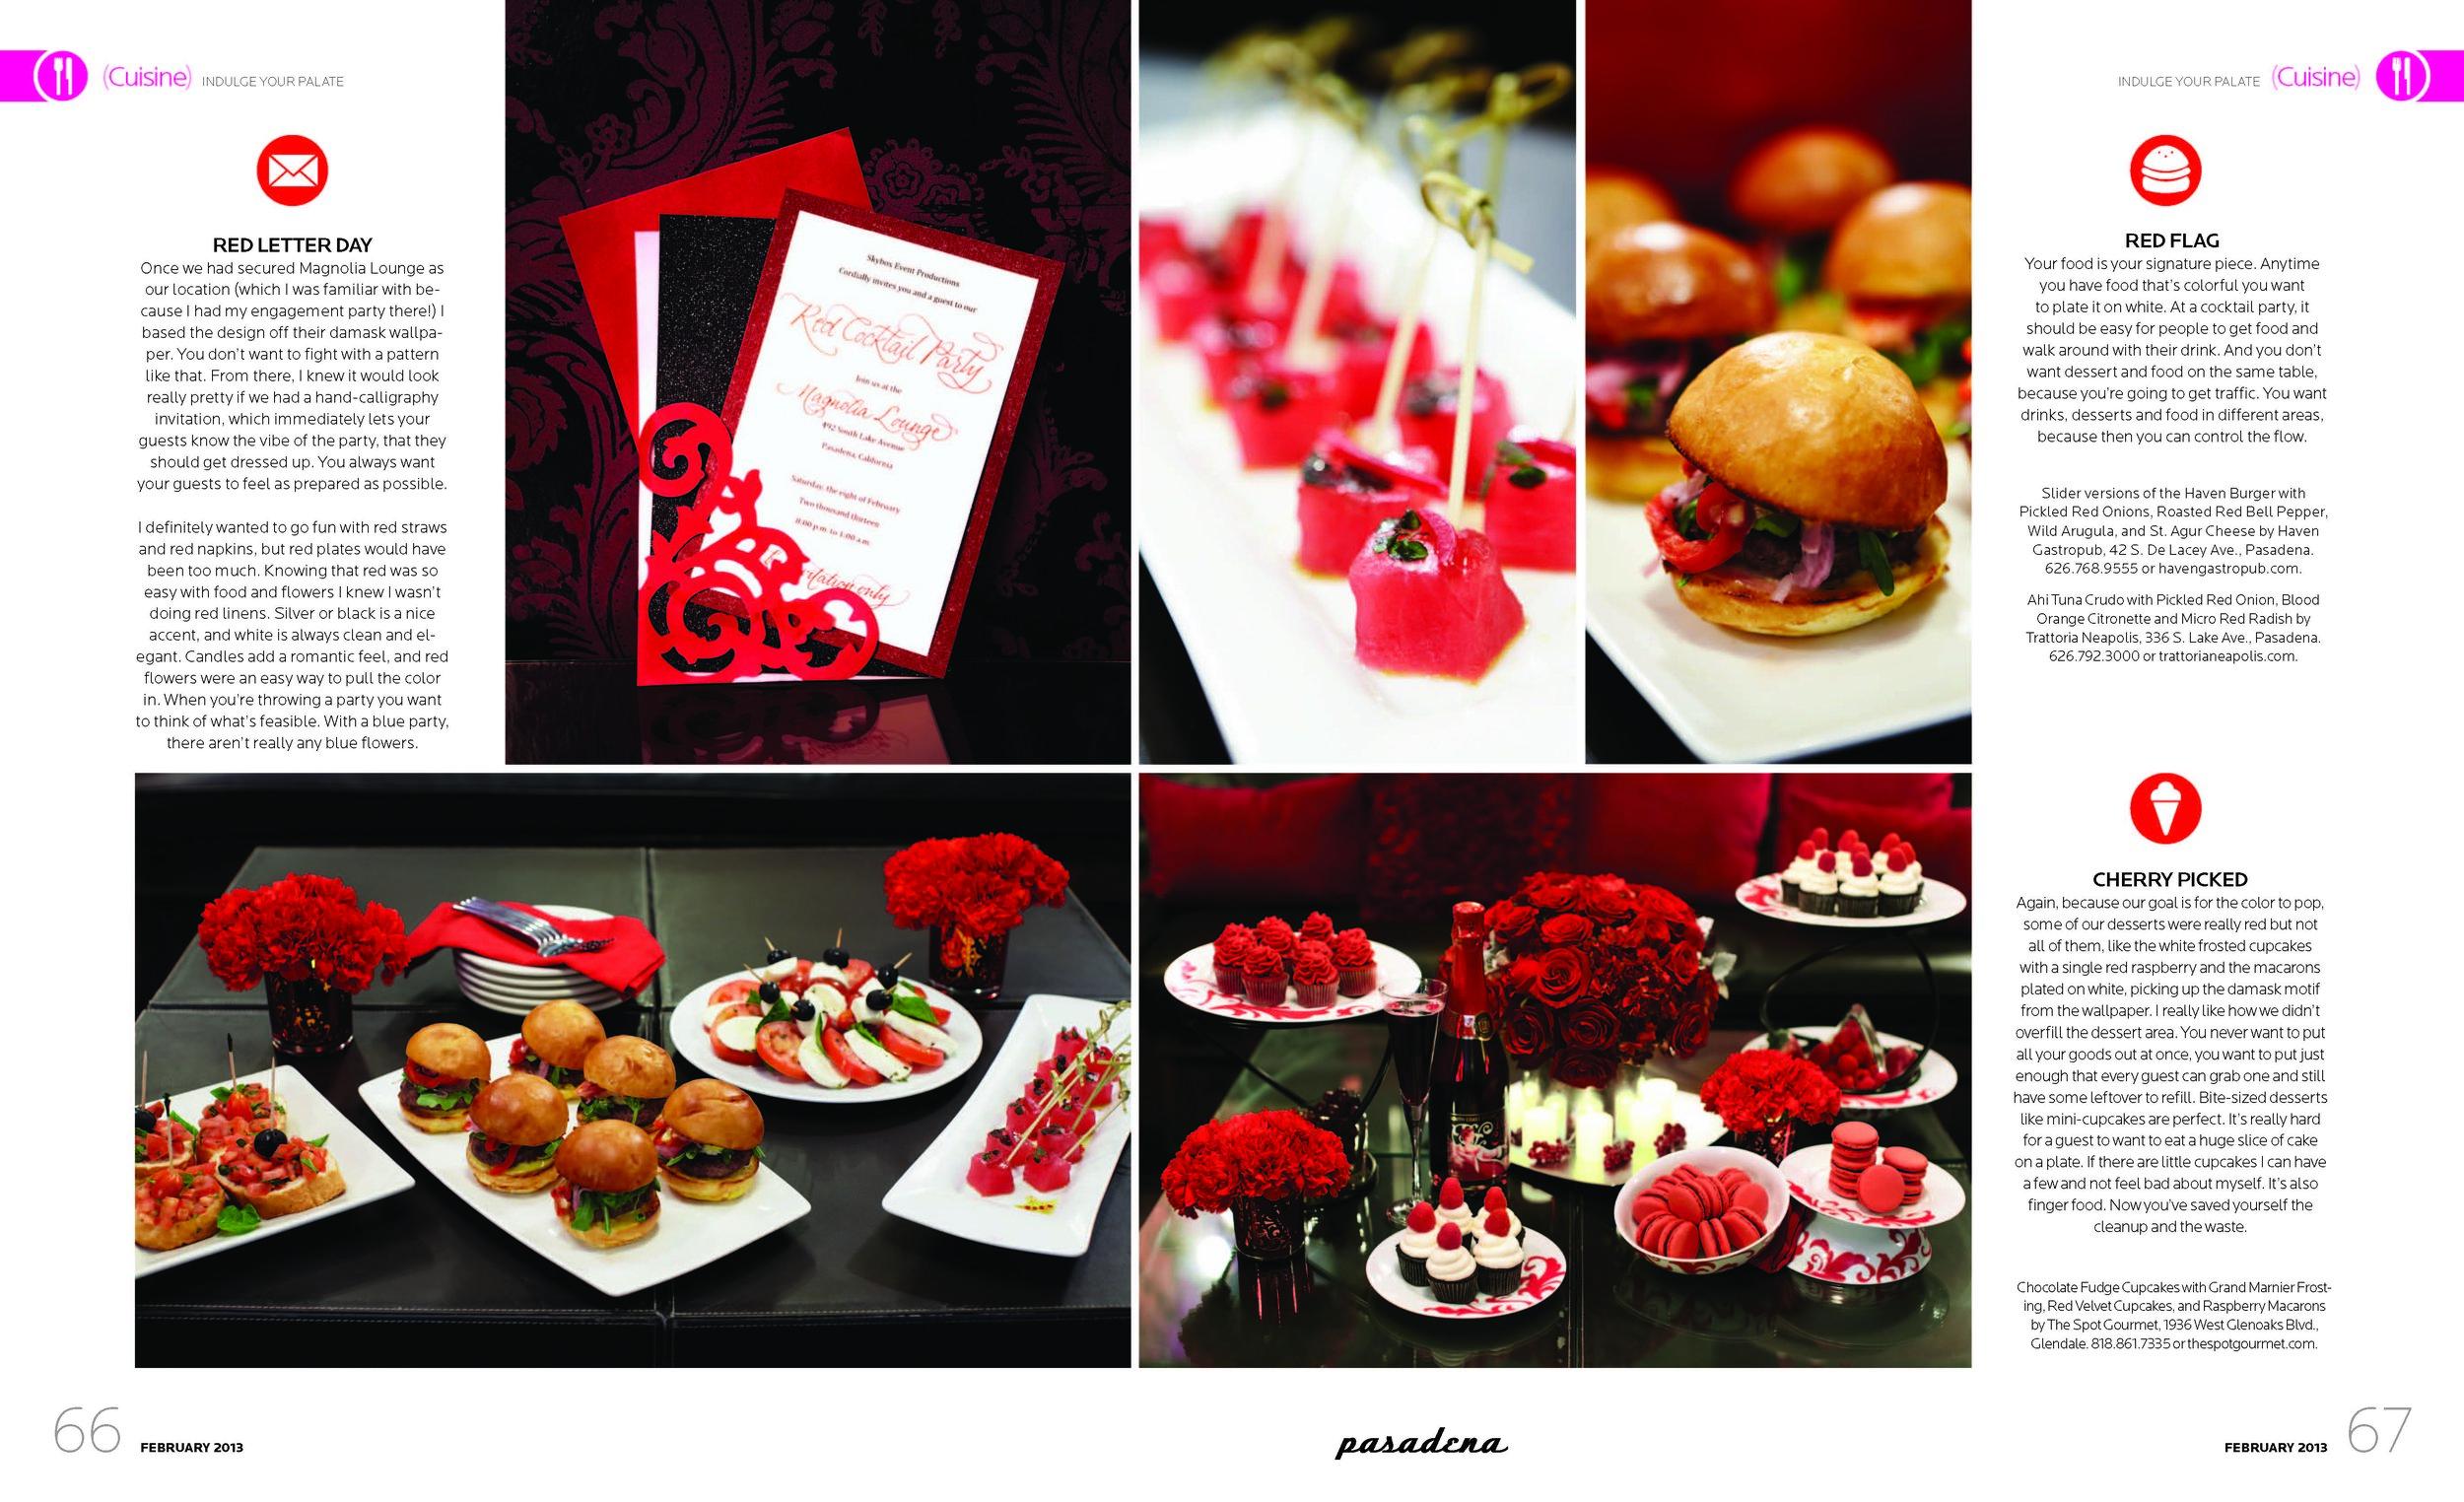 Cuisine_Feb13_Page_2.jpg